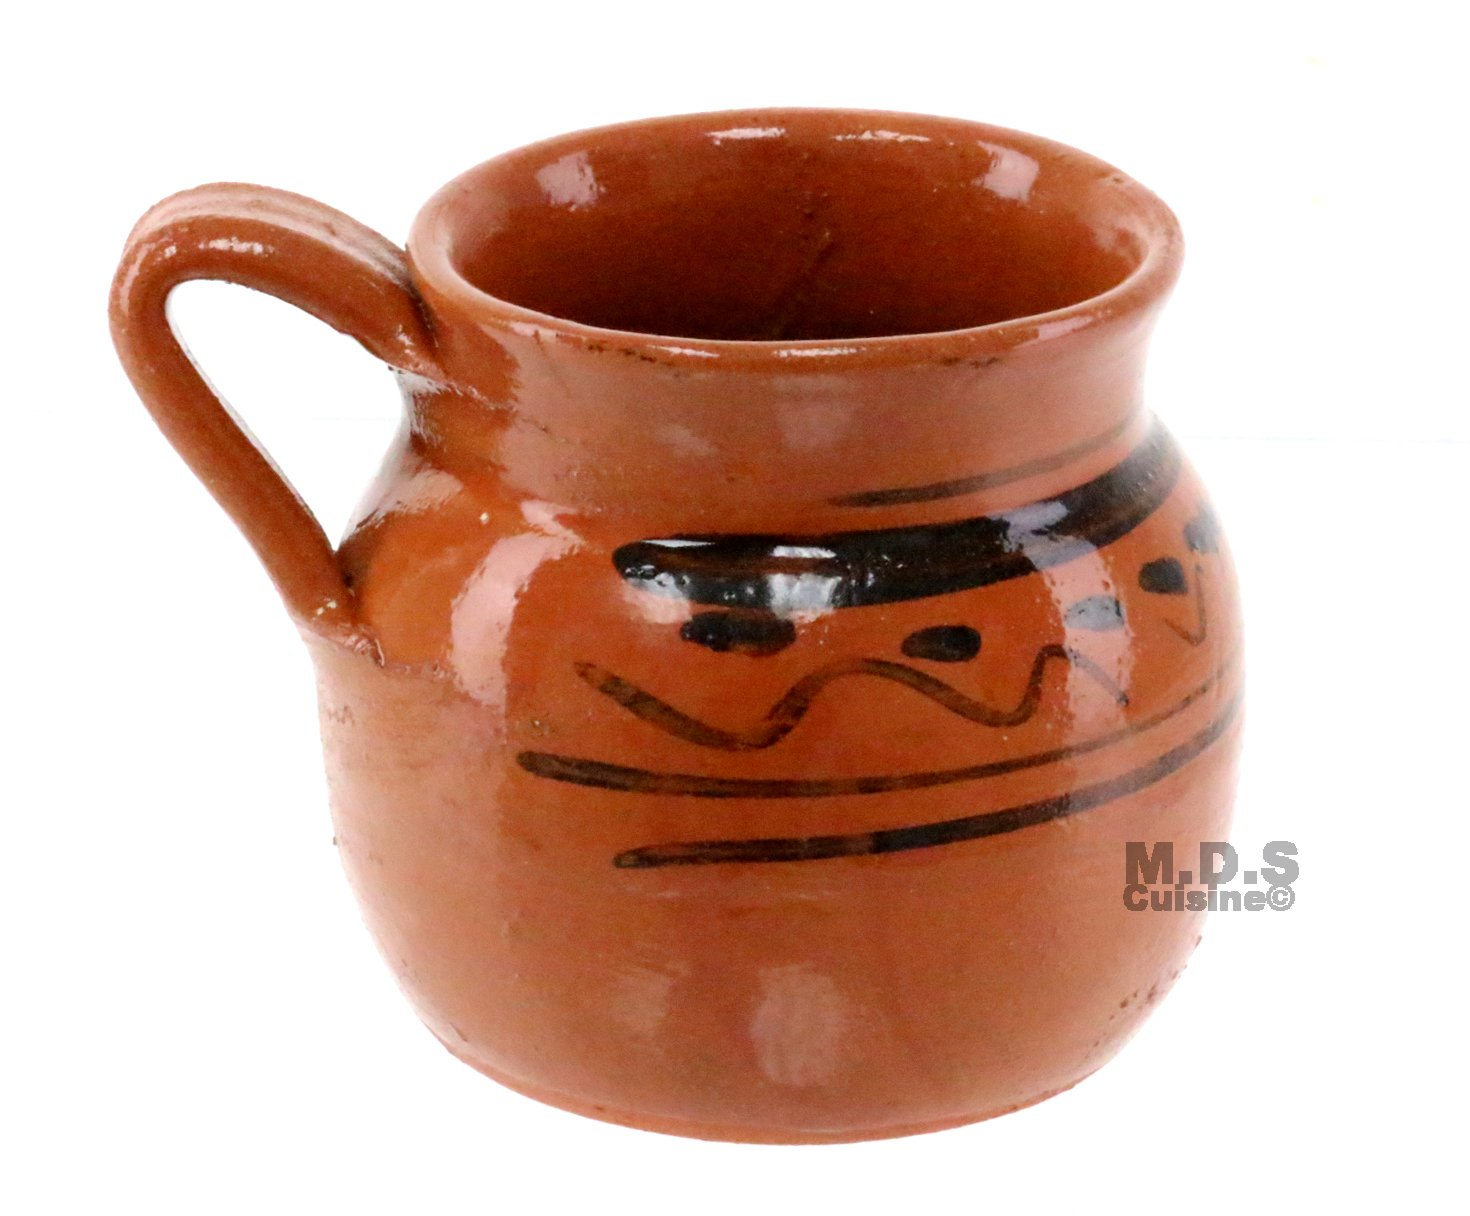 Taza De Barro 10 Oz. Jarro Mug Lead Free Traditional Decorative Mexican Clay Artisan Artezenia Hot Chocolate Champurrado Tepache Pulque Atole Cafe Coffee